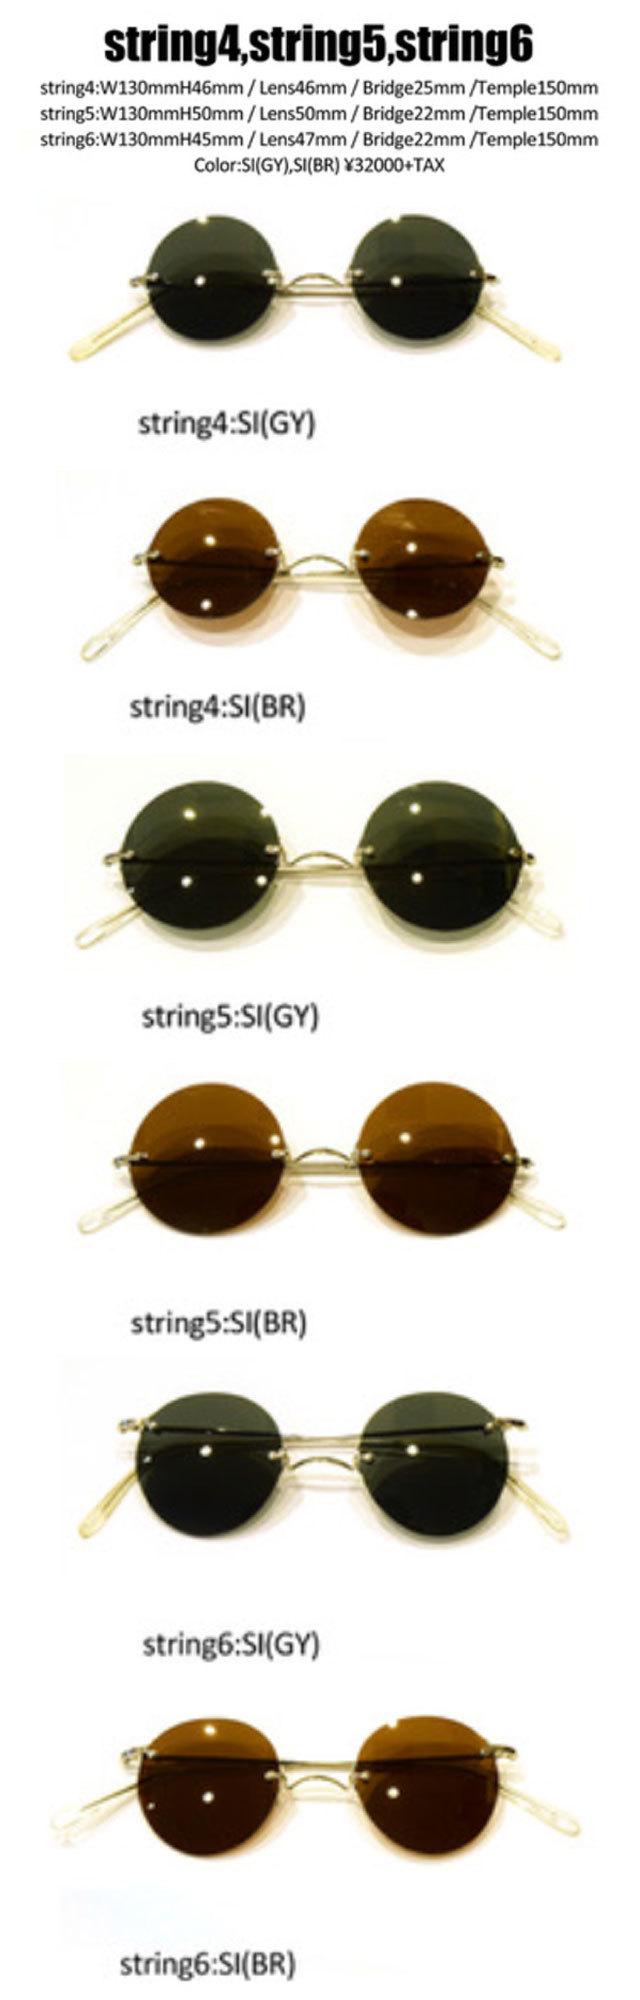 2019aw new string456